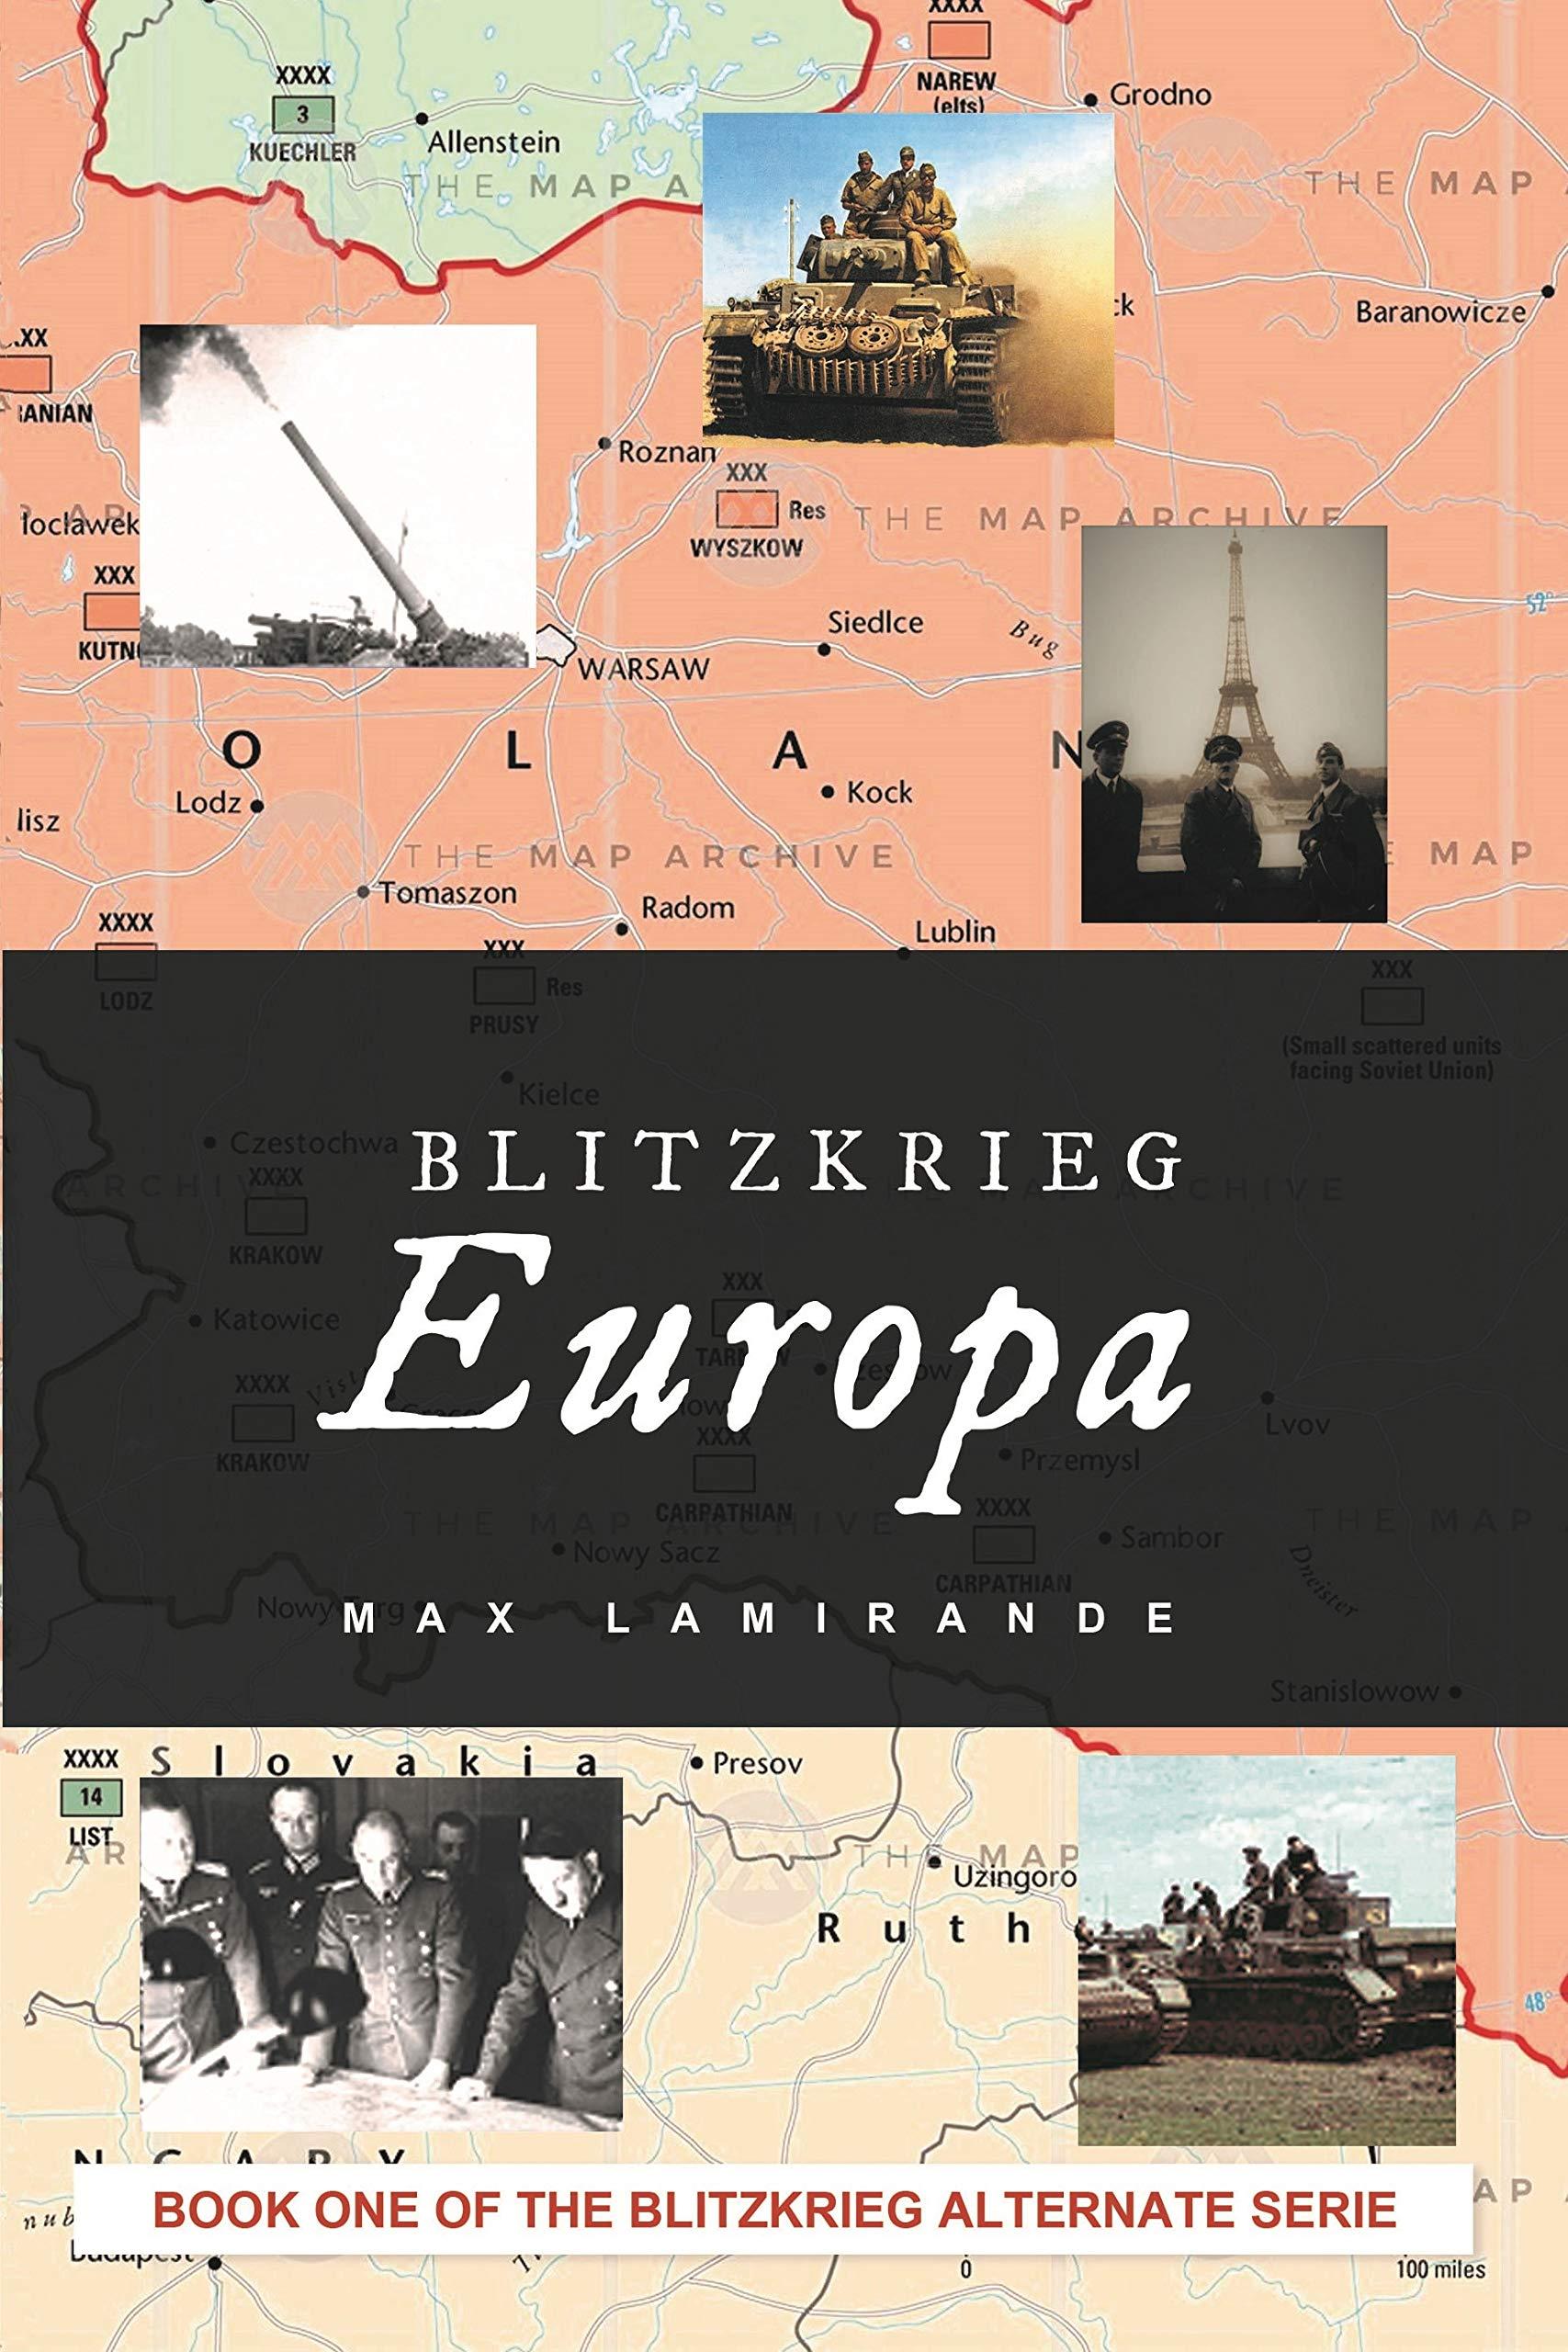 Blitzkrieg Europa: Book 1 of the Blitzkrieg Alternate serie